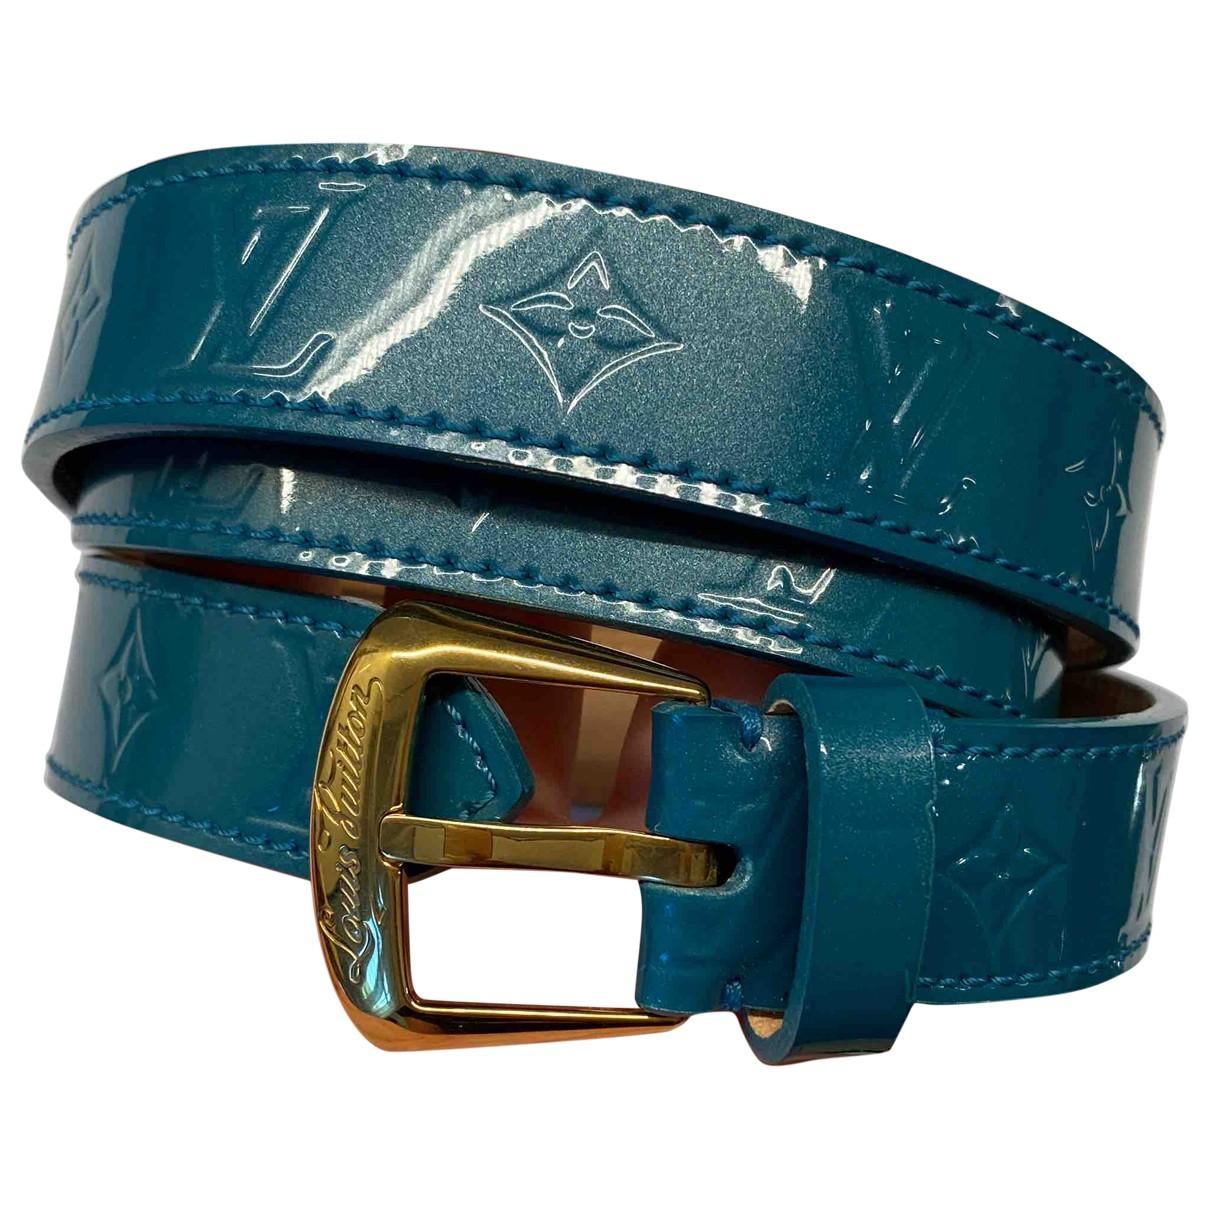 Cinturon de Charol Louis Vuitton